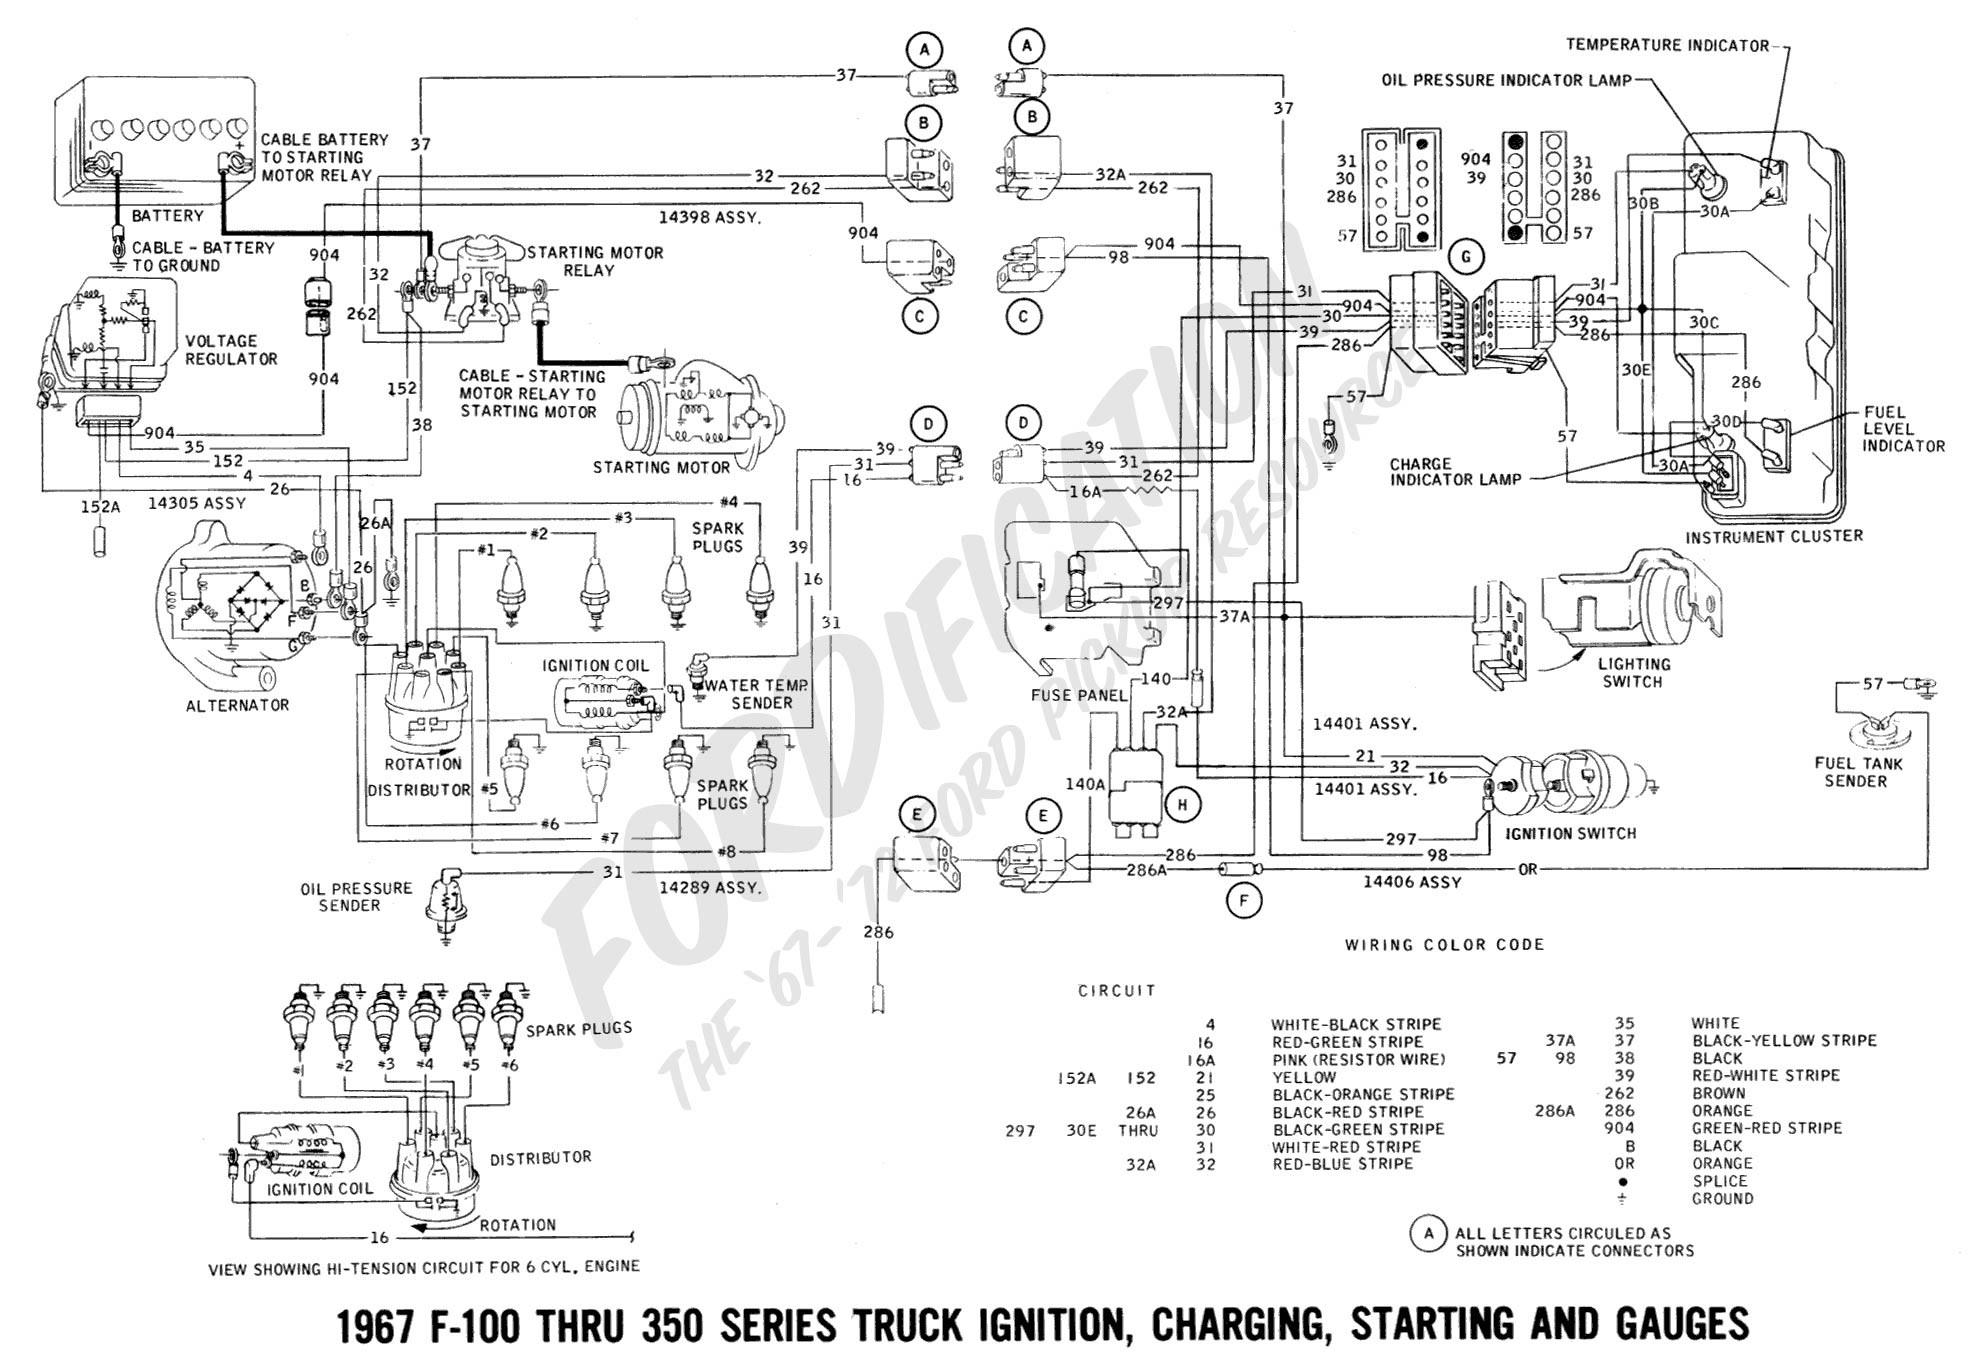 M2 Amu Wiring Diagram Schematics Diagrams Kenwood Kdc 7070r Freightliner Air Management Unit Download U2022 Rh Osomeweb Com Browning Blueprints Machine Gun Parts